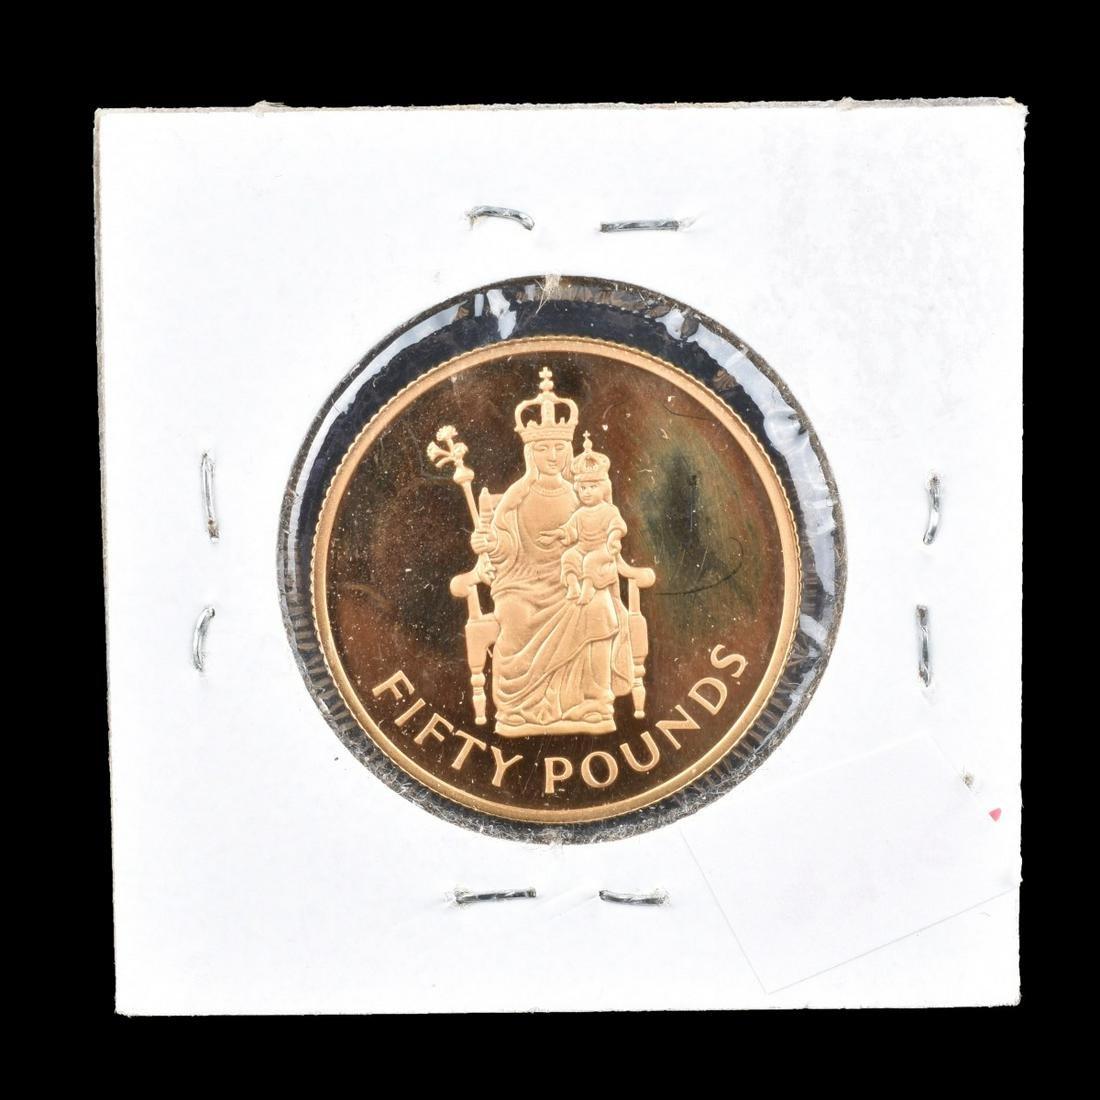 1975 Great Britain - Elizabeth II Gold 50 Pounds